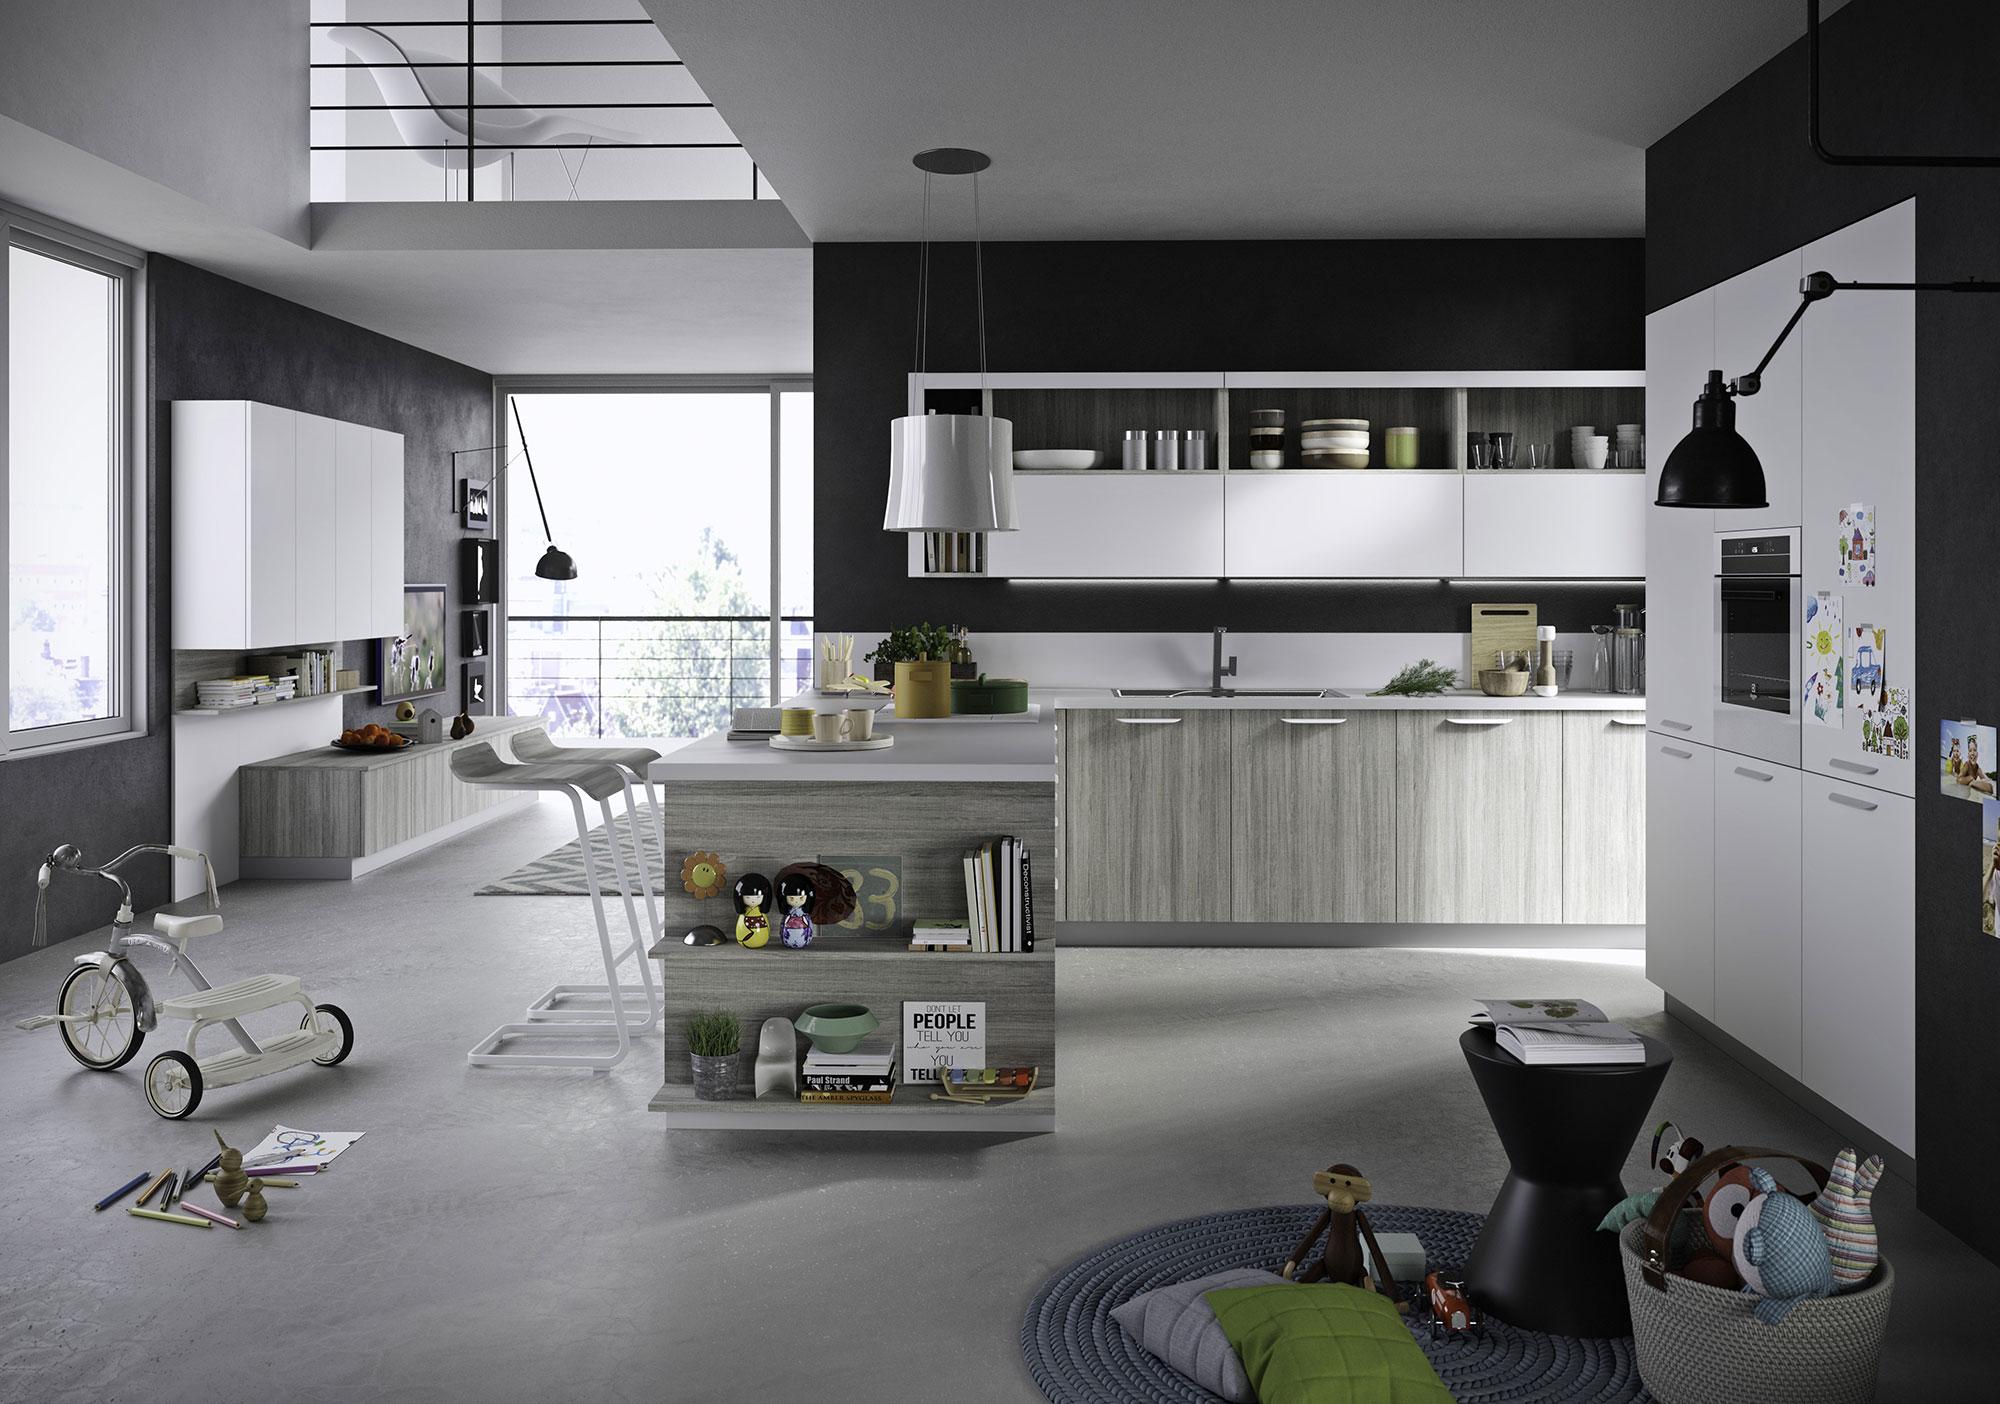 cucina-Fun-eucalipto-nabiti-1